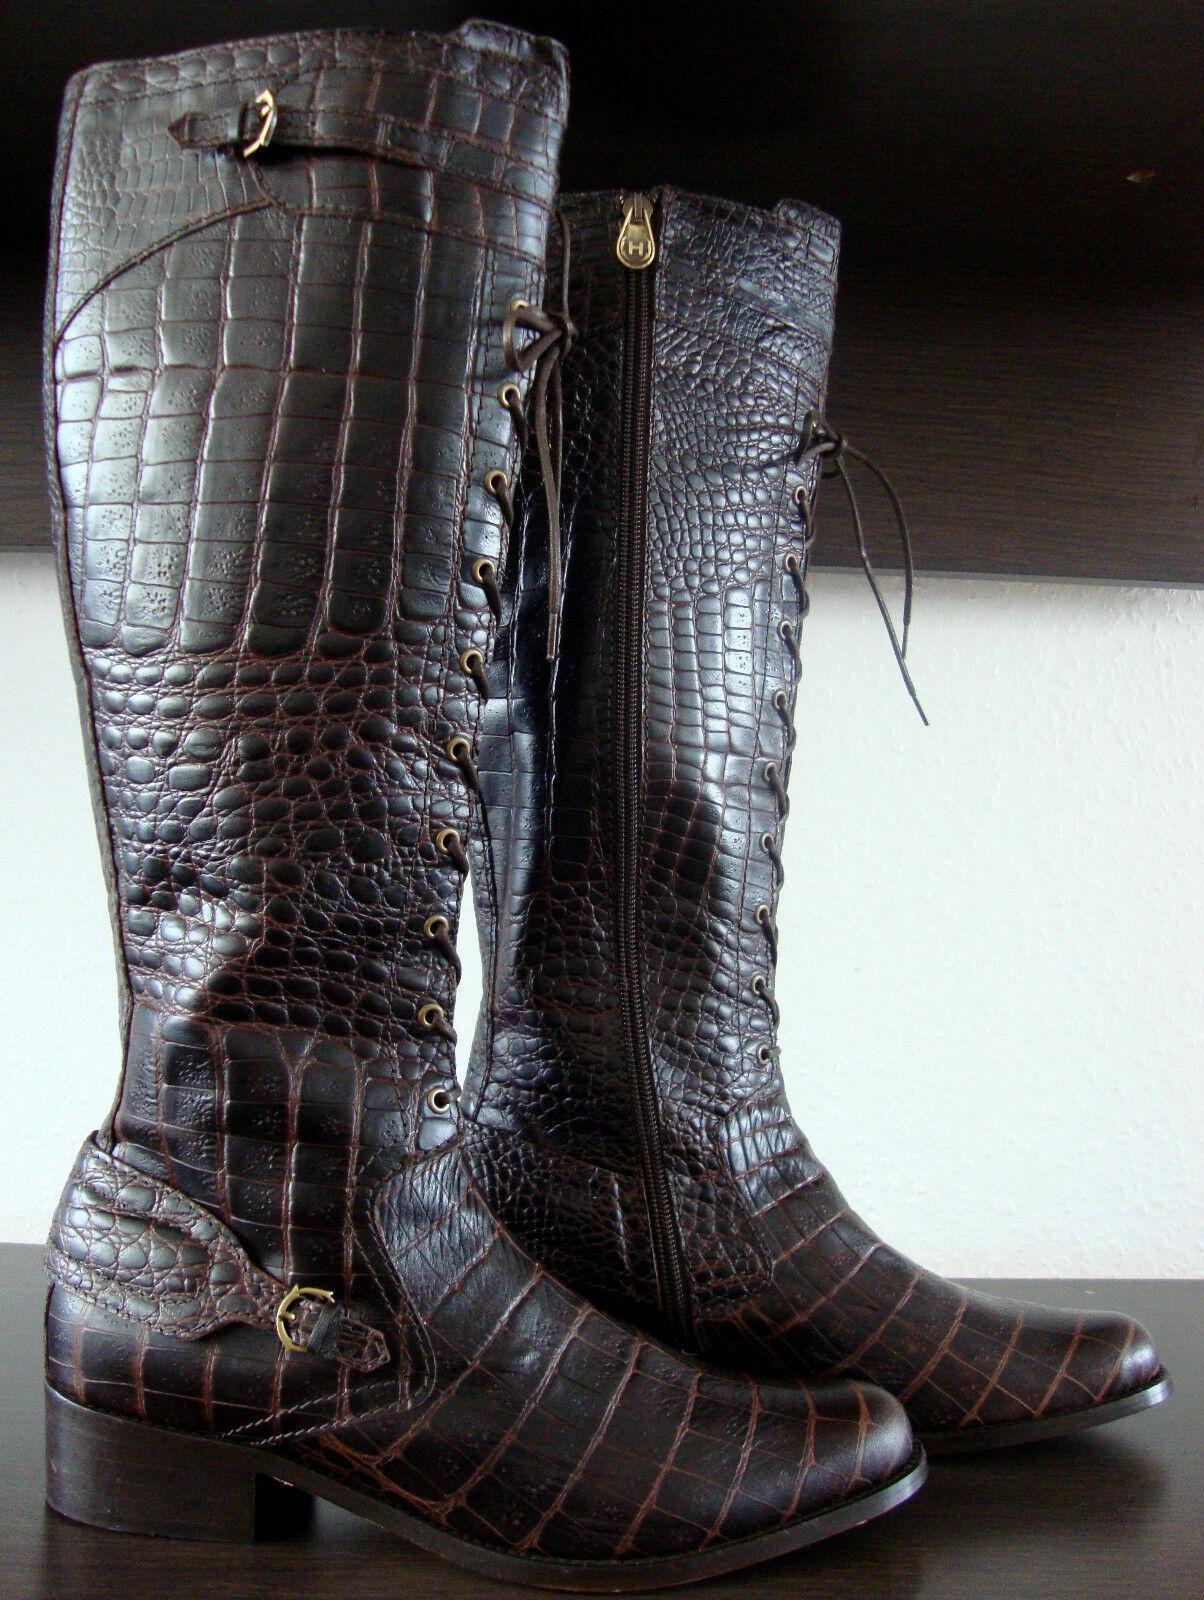 HUNTER BEAUFORT CROCO Chocolate Knee High Stiefel Damen Leder Stiefel Gr.40 NEU